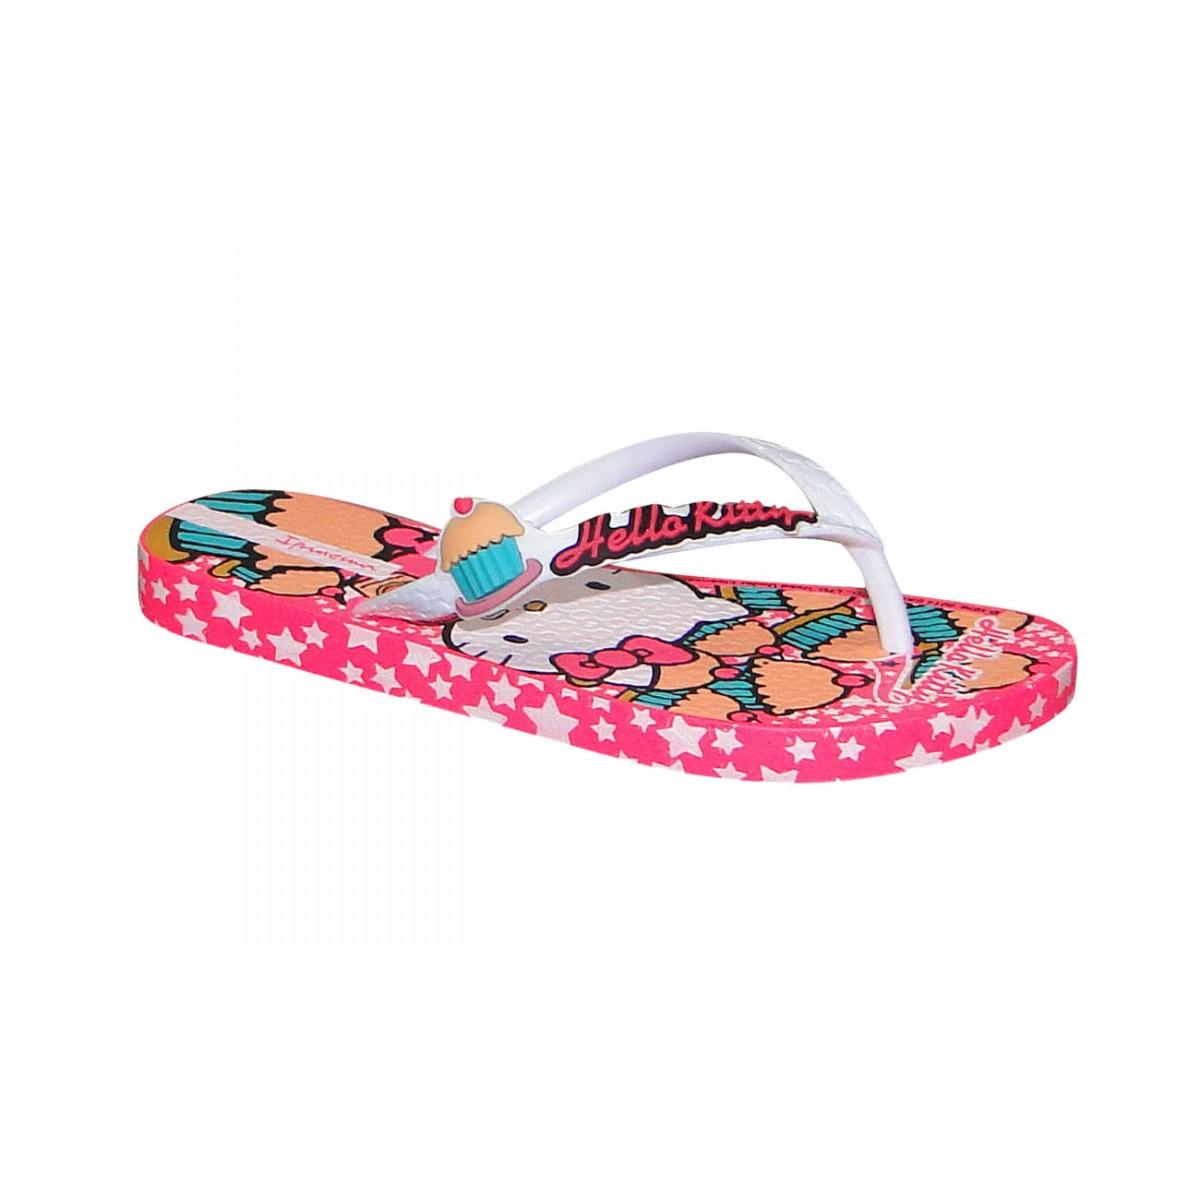 d3cd24305 Chinelo Hello Kitty 25623 Infantil 25623-23705 - Rosa/Branco ...